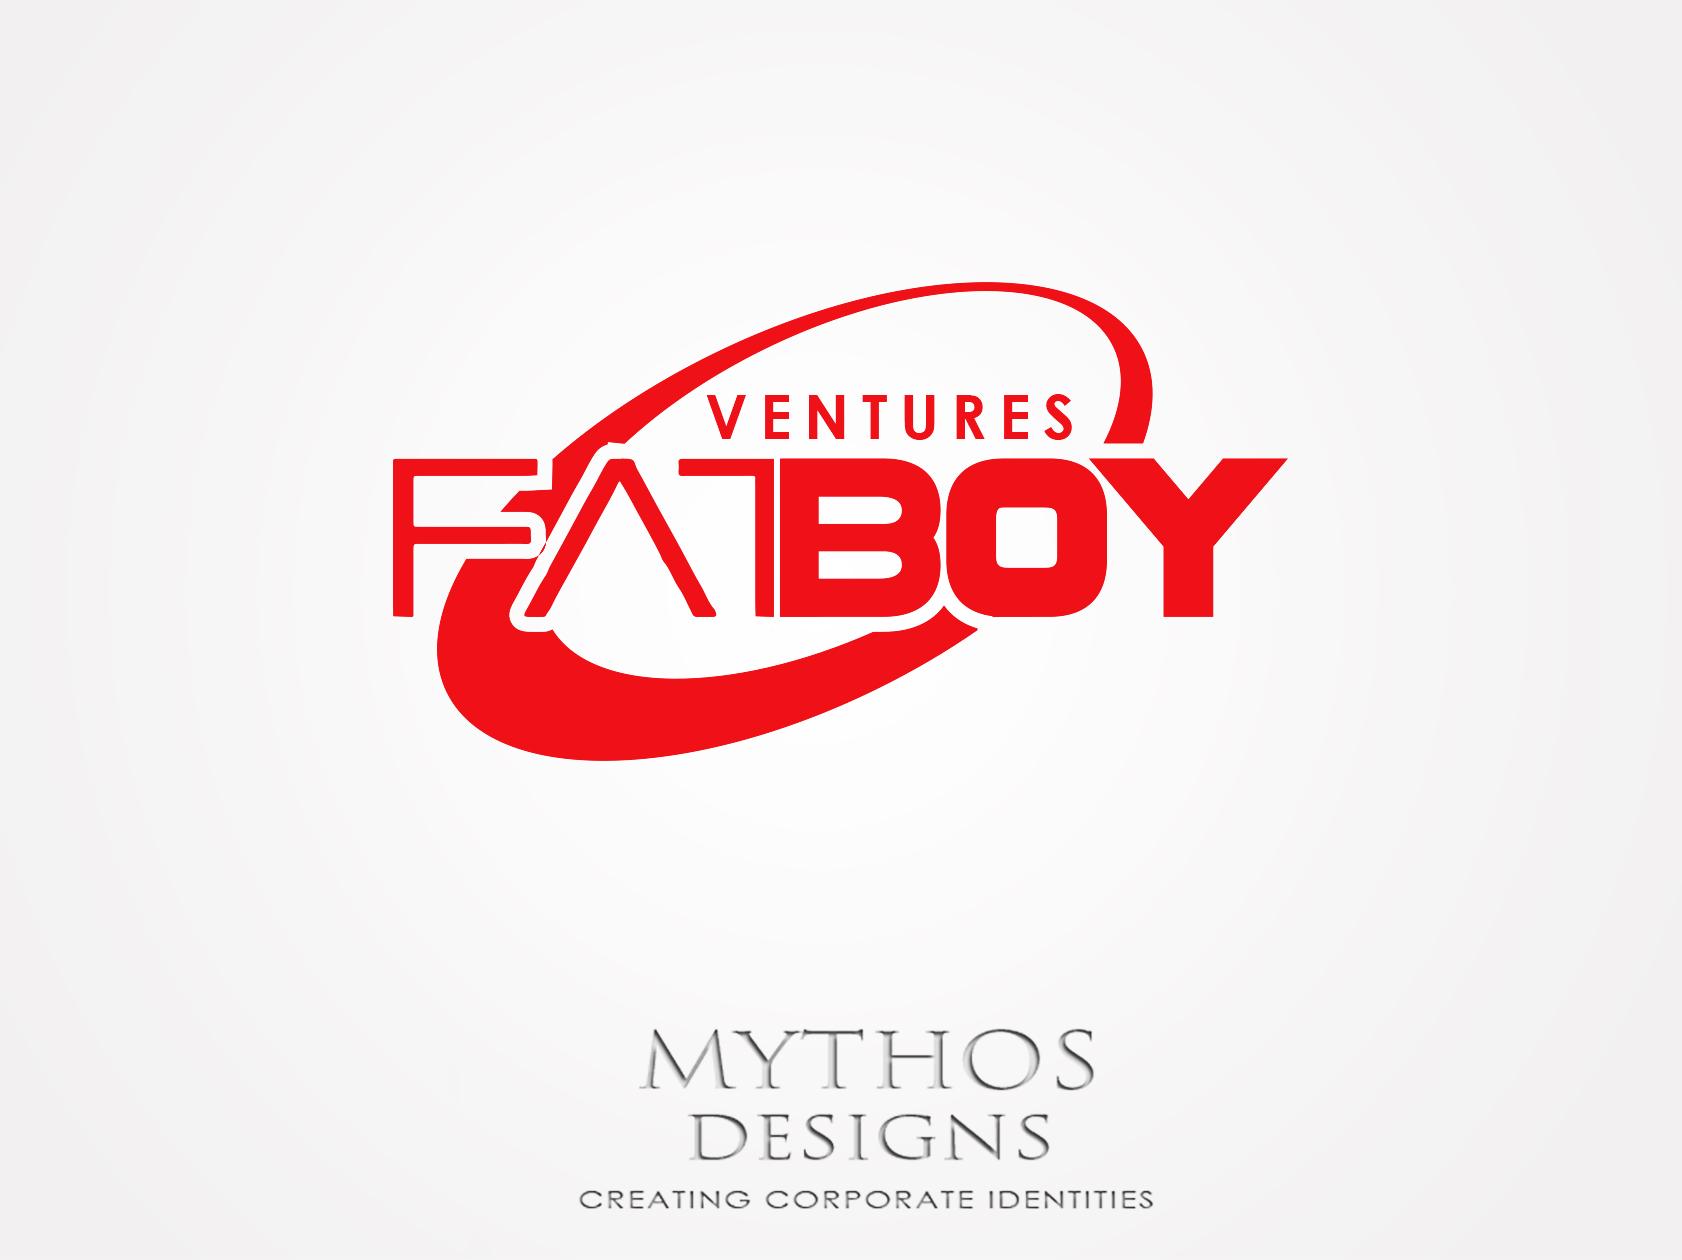 Logo Design by Mythos Designs - Entry No. 132 in the Logo Design Contest Fun Logo Design for Fat Boy Ventures.